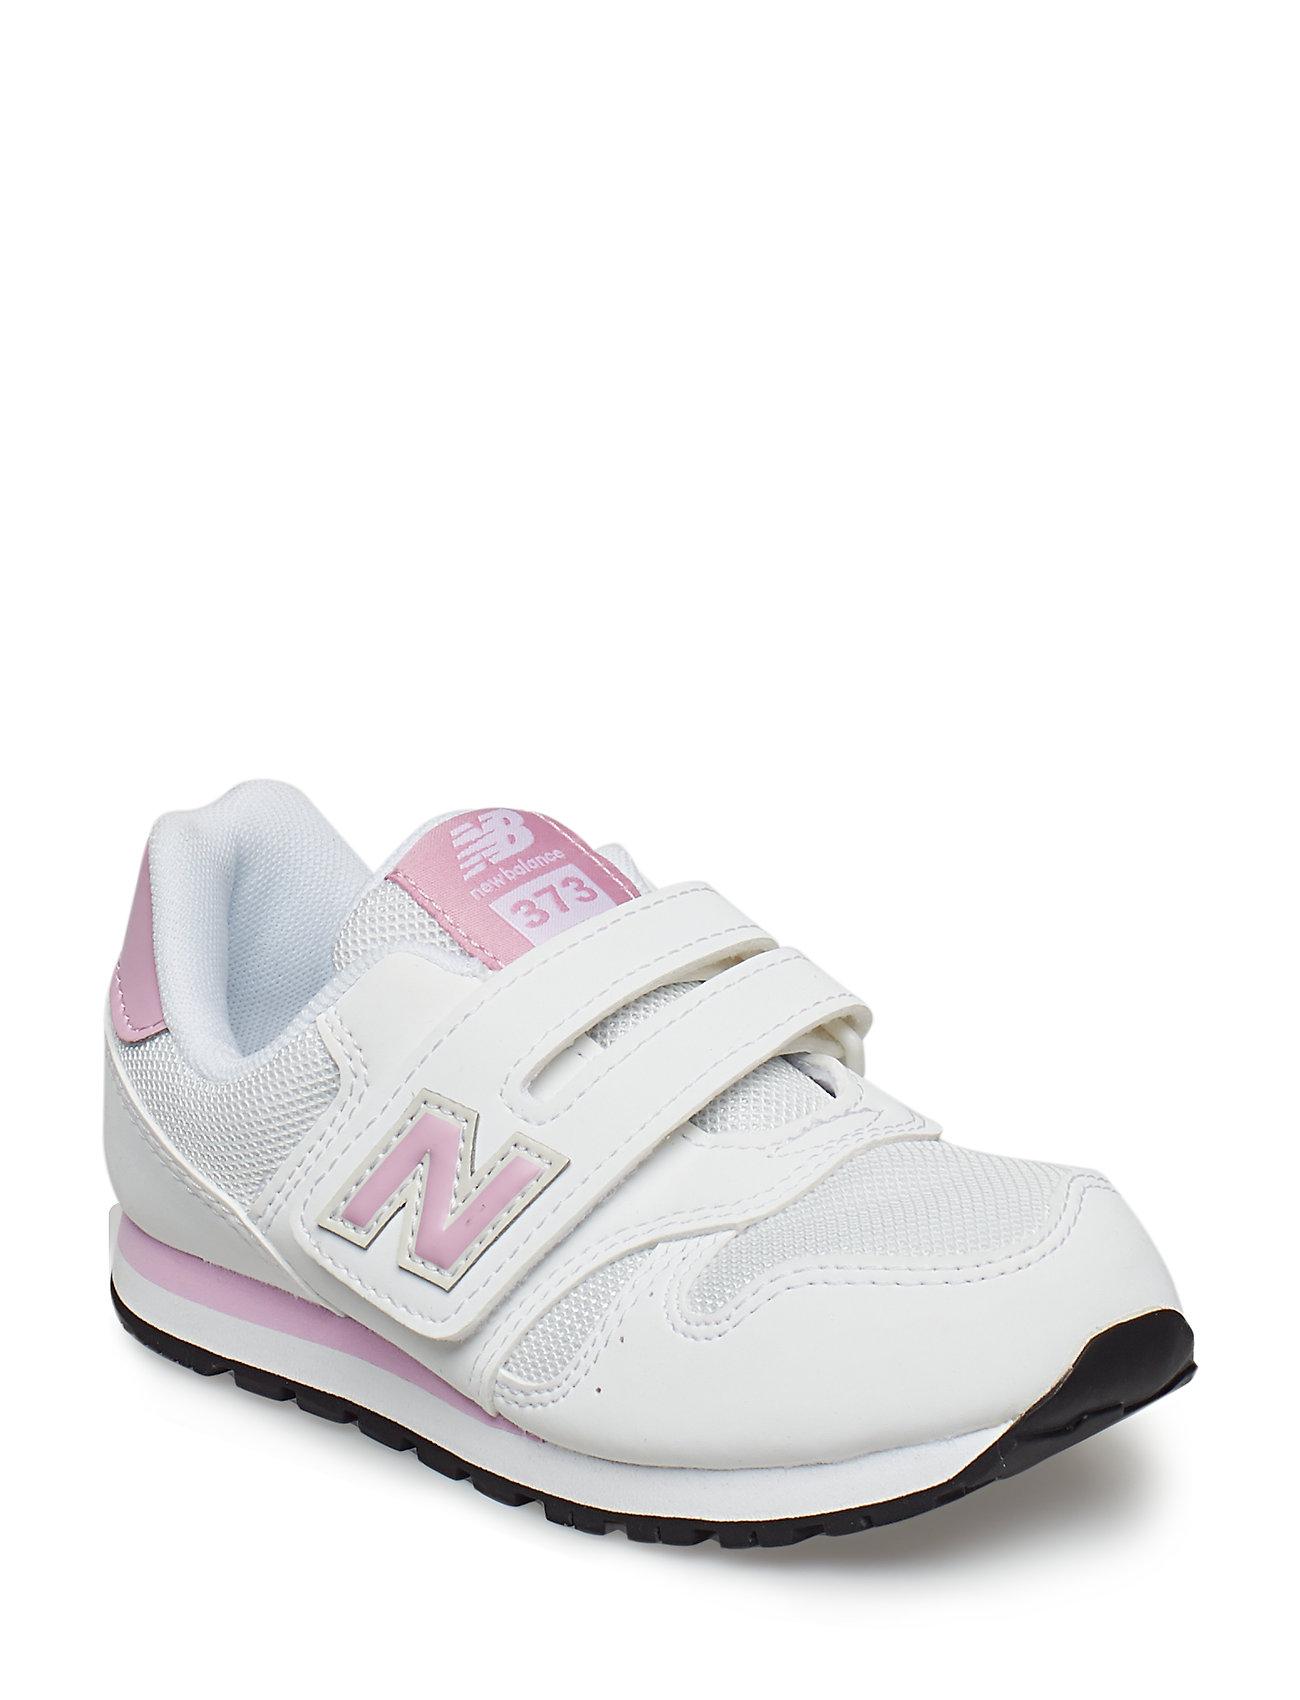 New Balance IV373 - WHITE